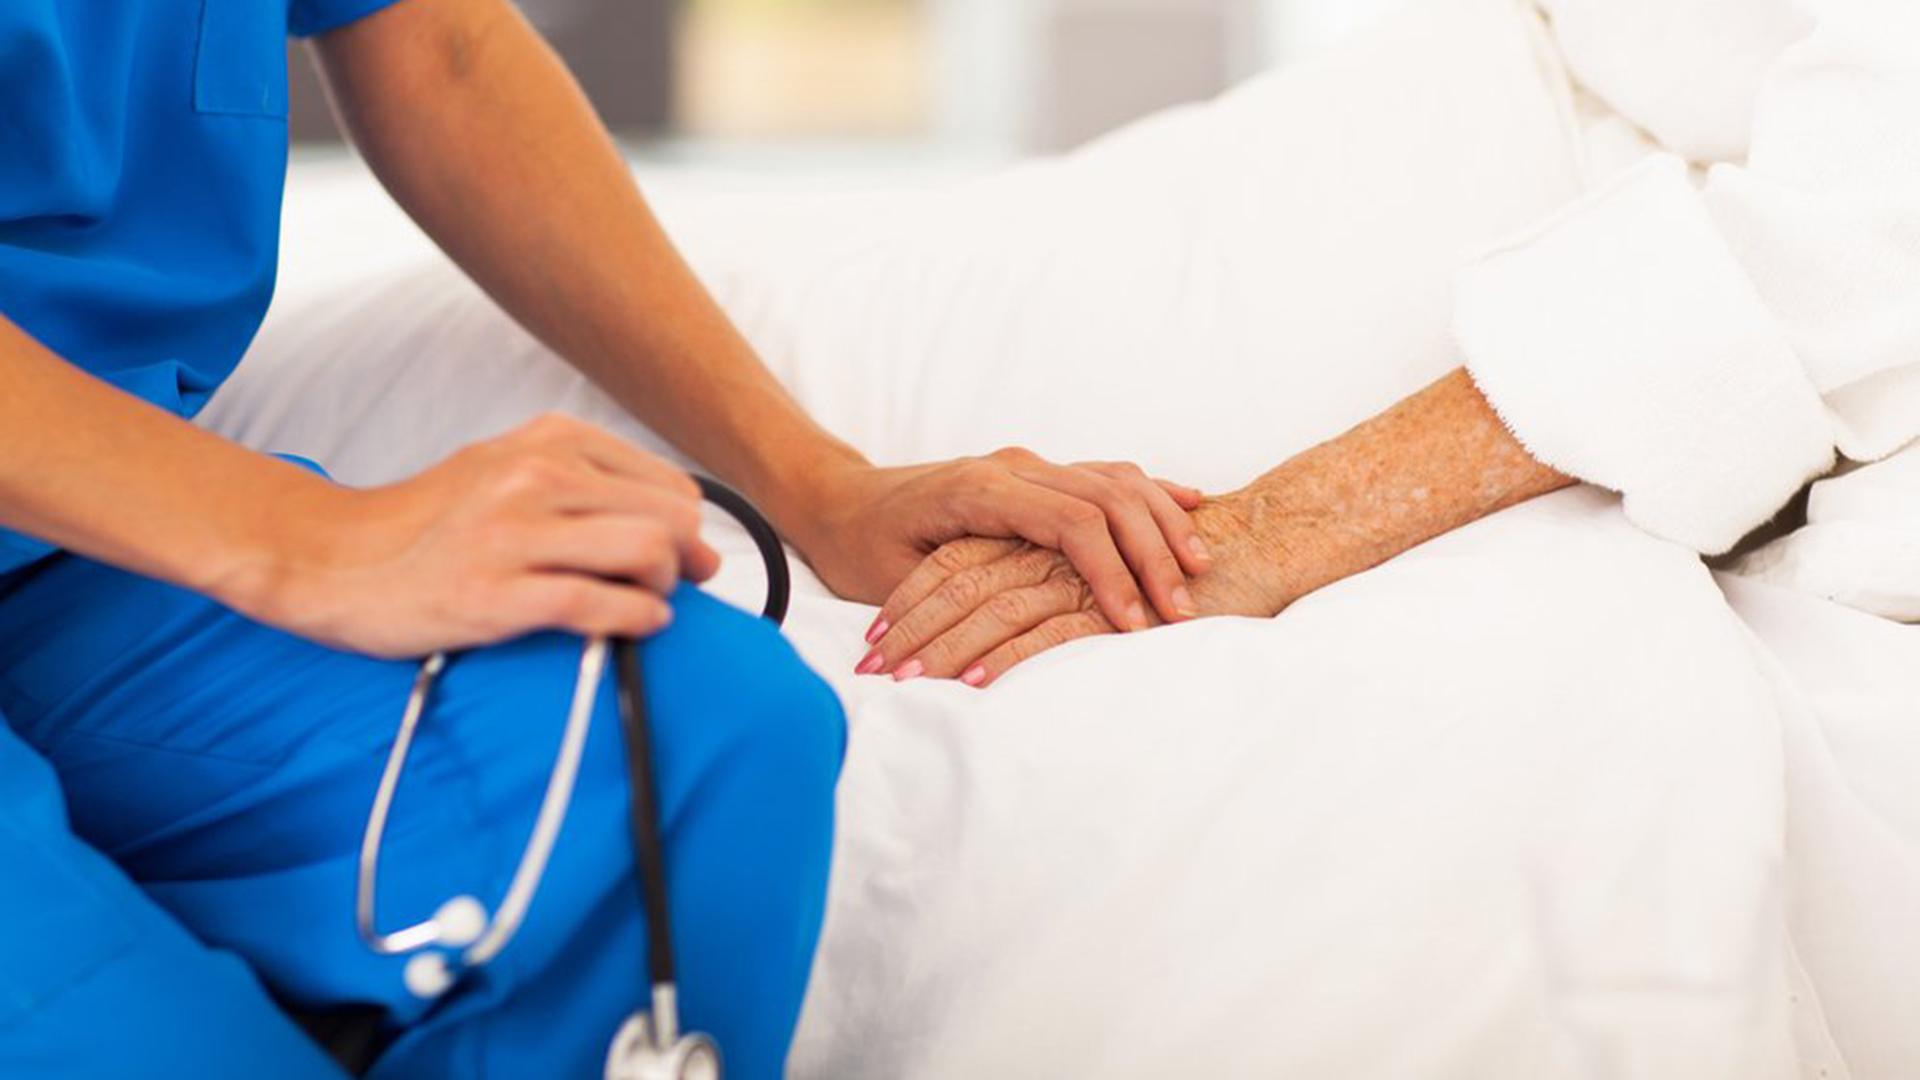 Reikalingi slaugos specialistai